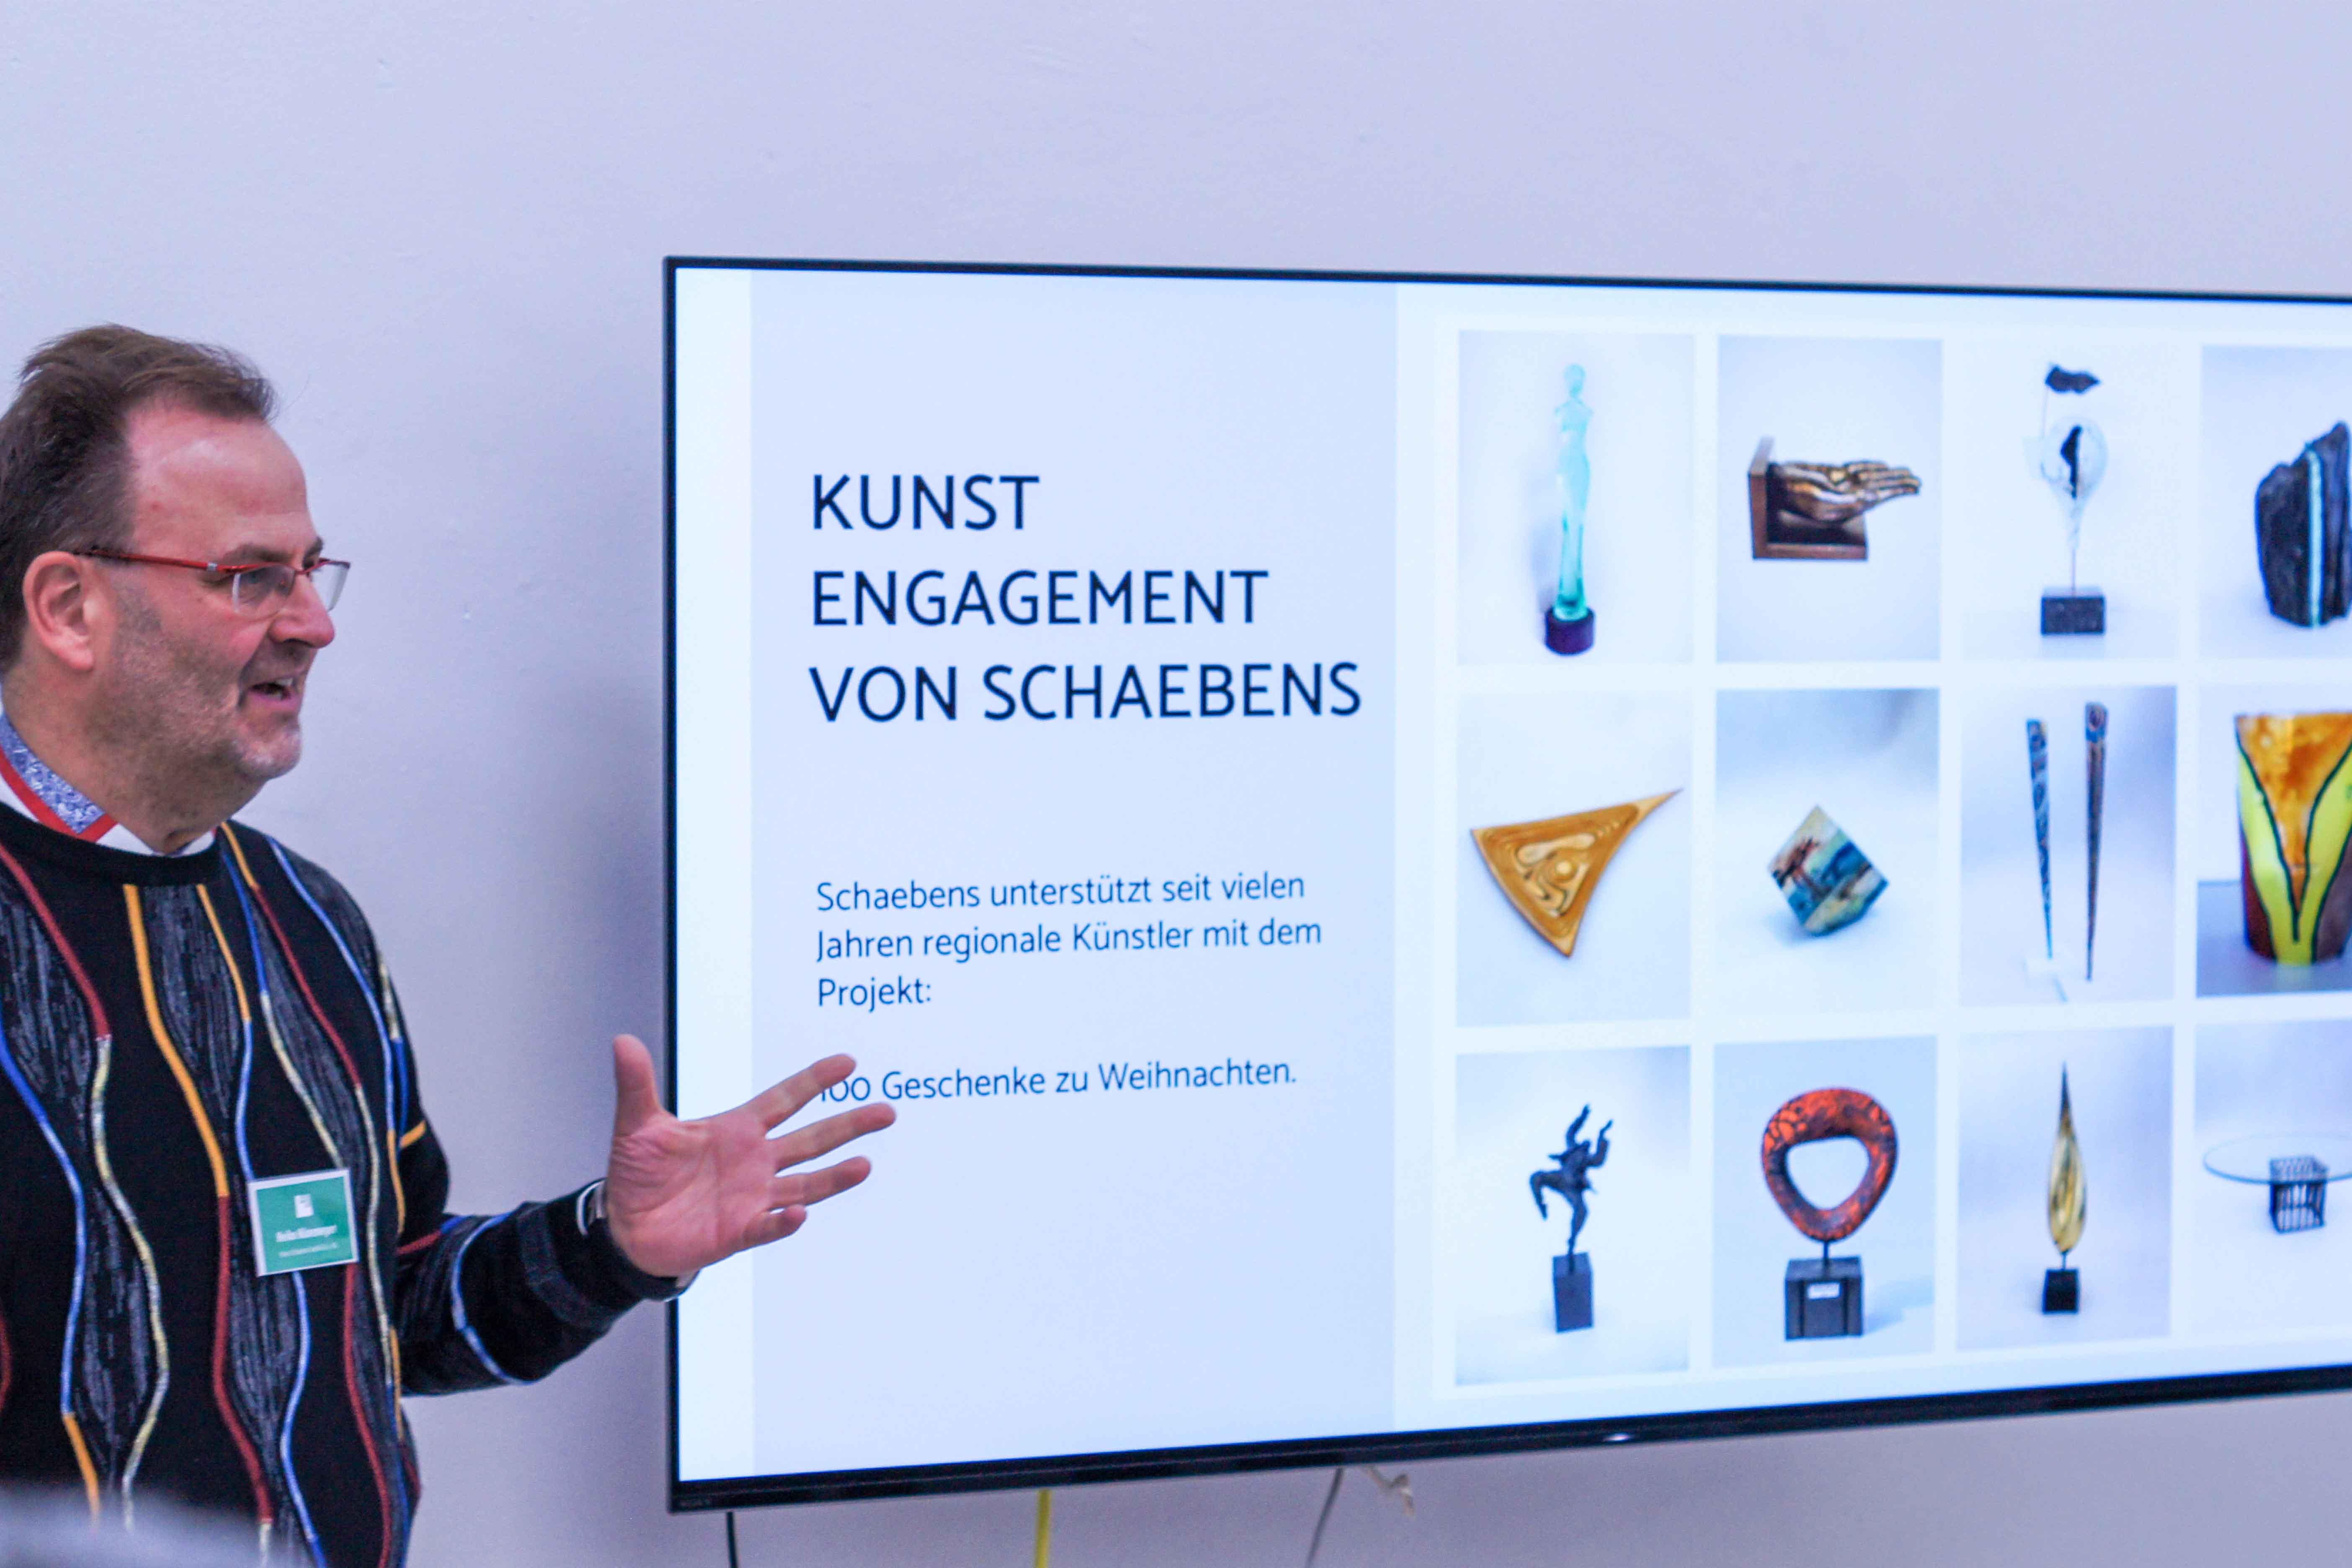 schaebens-zerowasteart-kunst-umwelt-partner-plastikmuell-interaktiv-kunstausstellung-vernissage